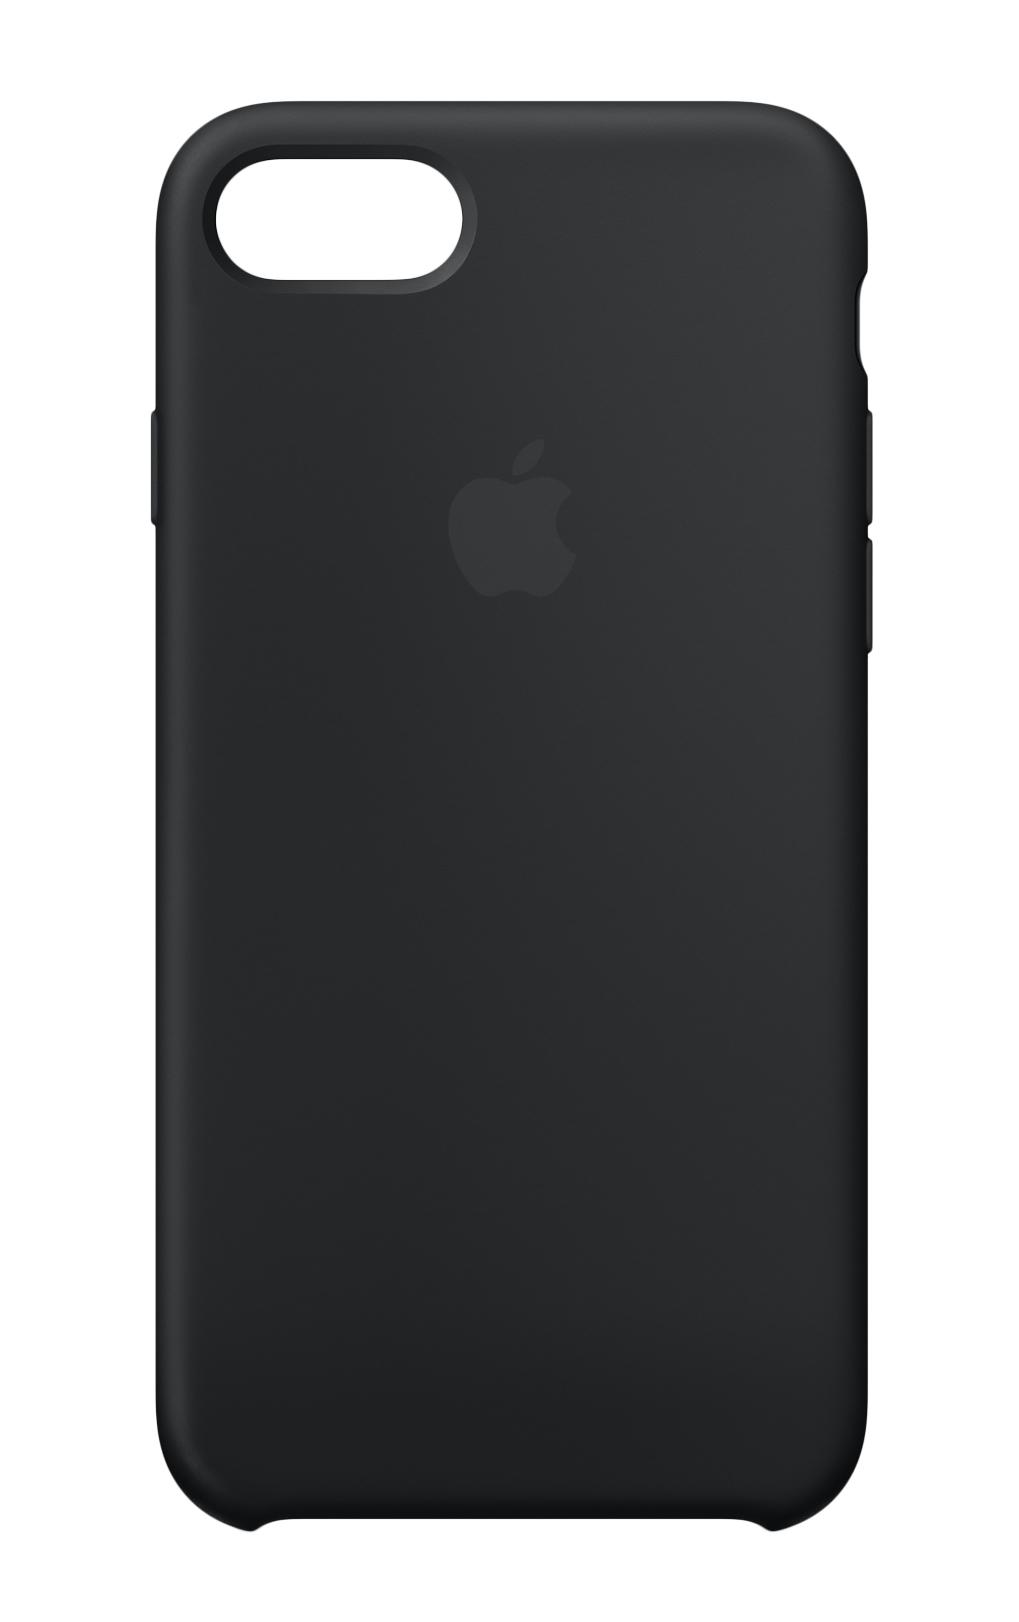 "Apple MQGK2ZM/A funda para teléfono móvil 11,9 cm (4.7"") Funda blanda Negro"